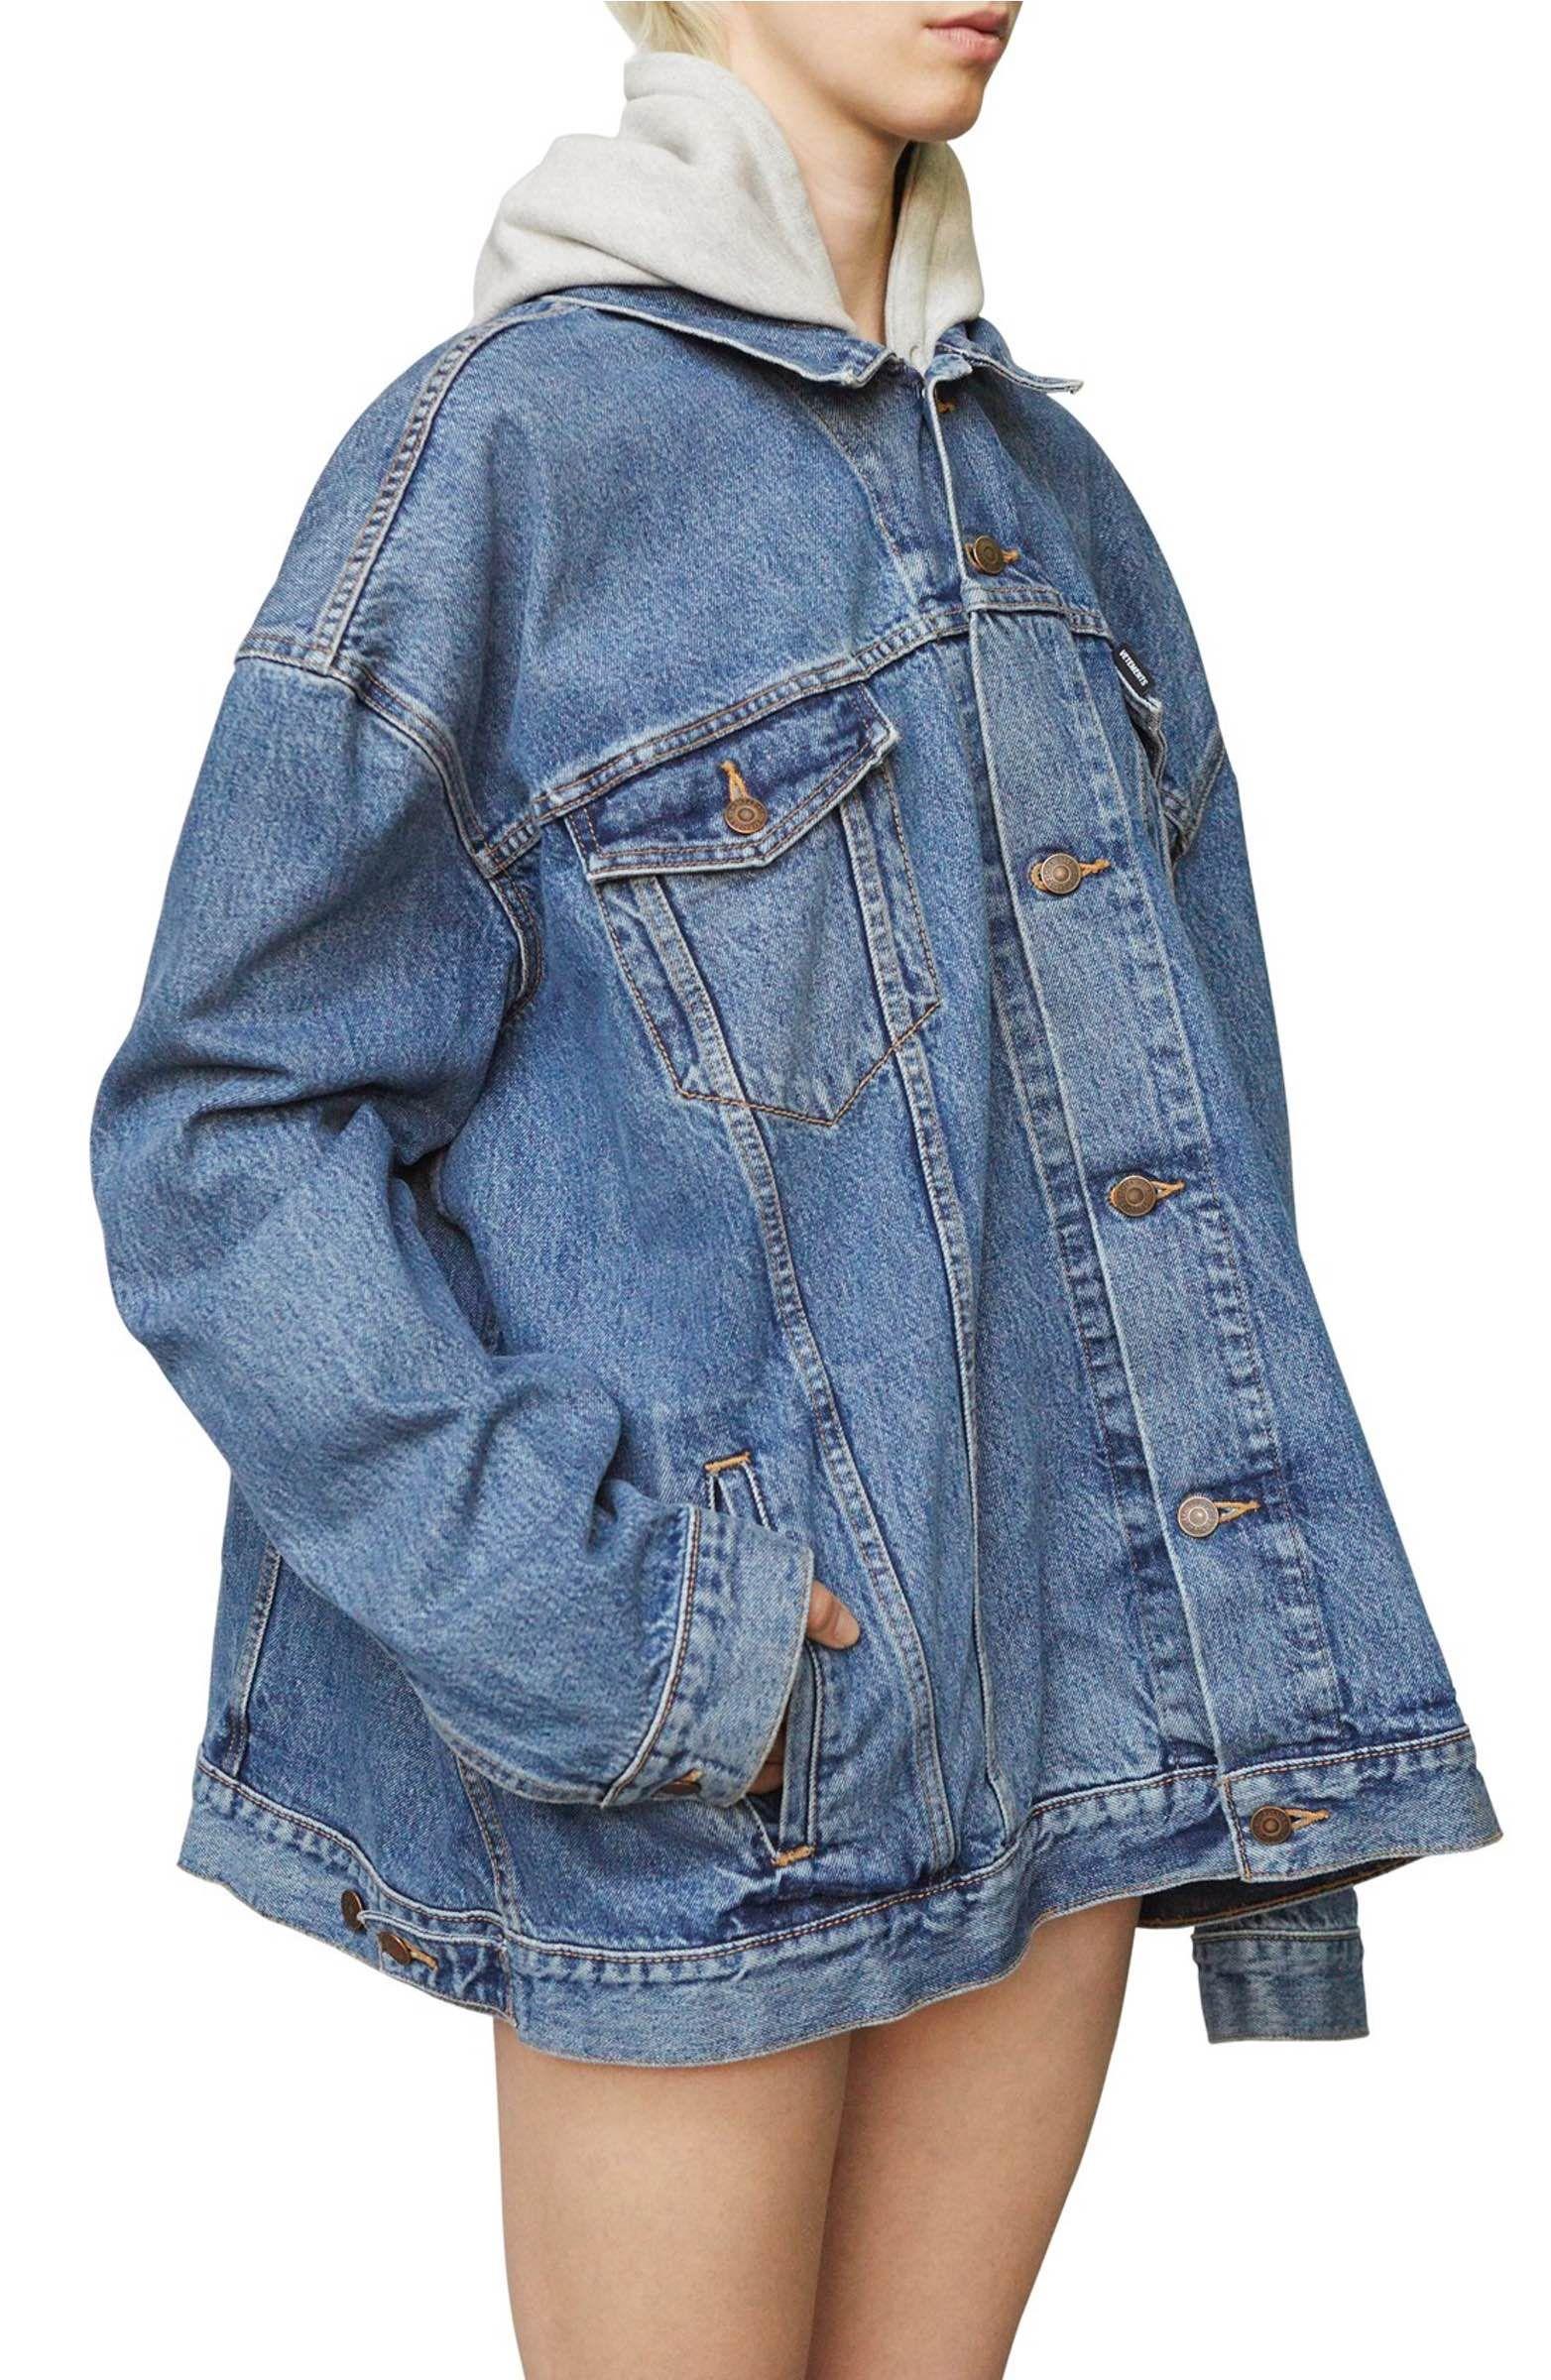 Main Image - Vetements x Levi's® Denim Jacket